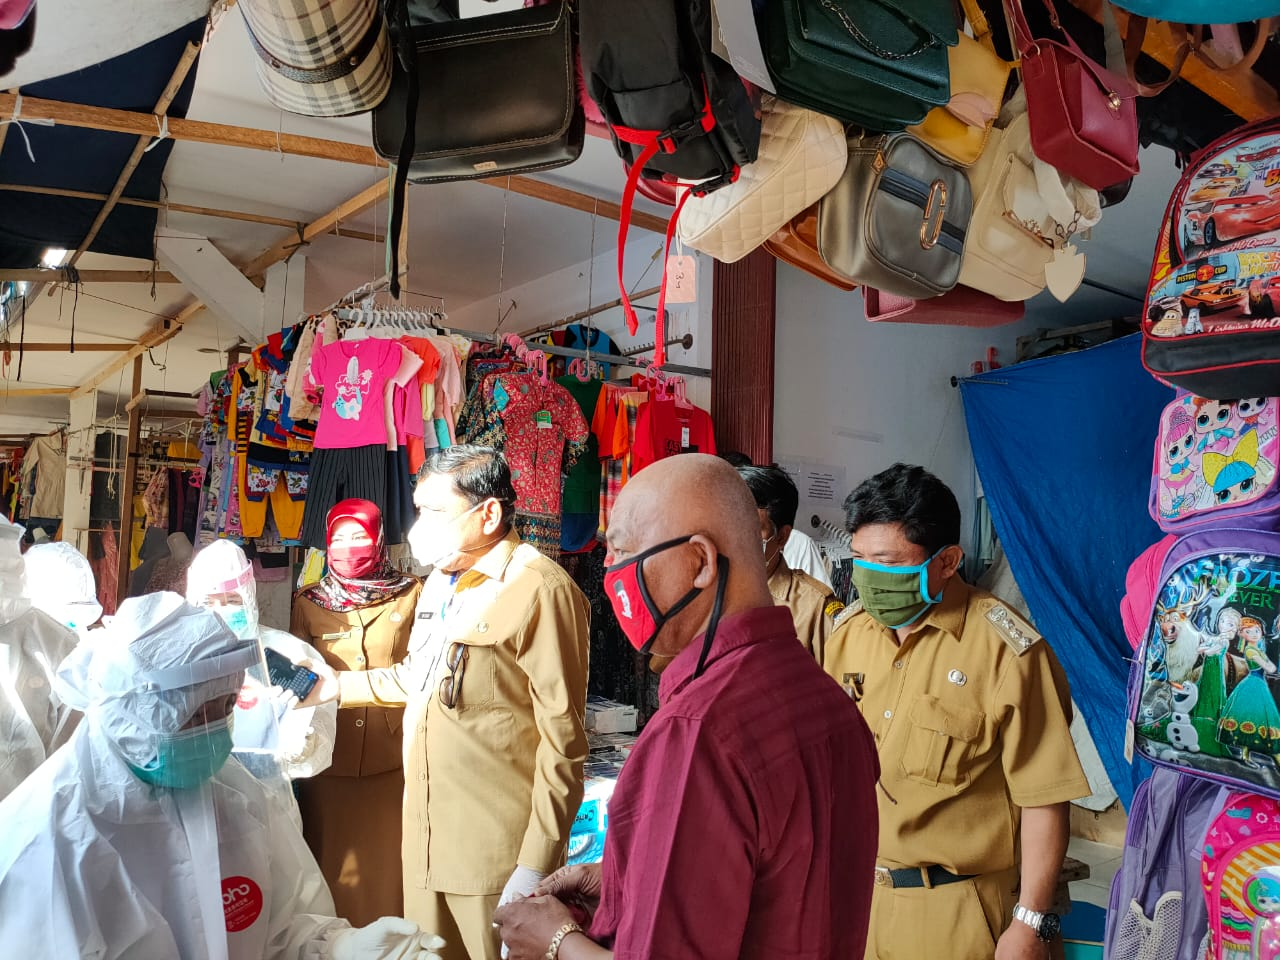 Bupati Mian Pantau Langsung Pelaksanaan Rapid Test di Pasar Lagita